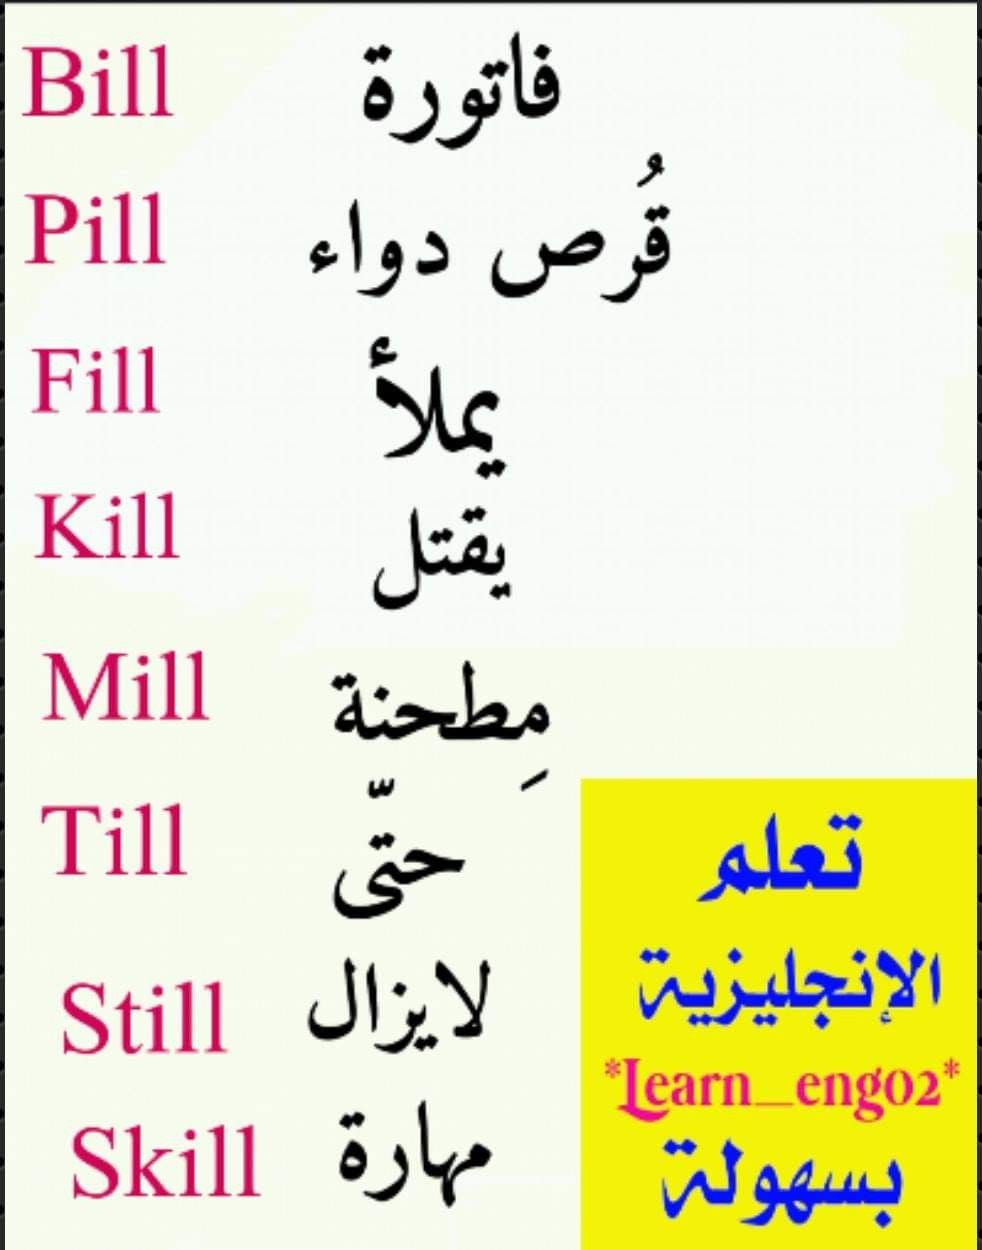 Pin By محمد الخالدي On English Language Learning Learn English Words English Language Learning Grammar English Words